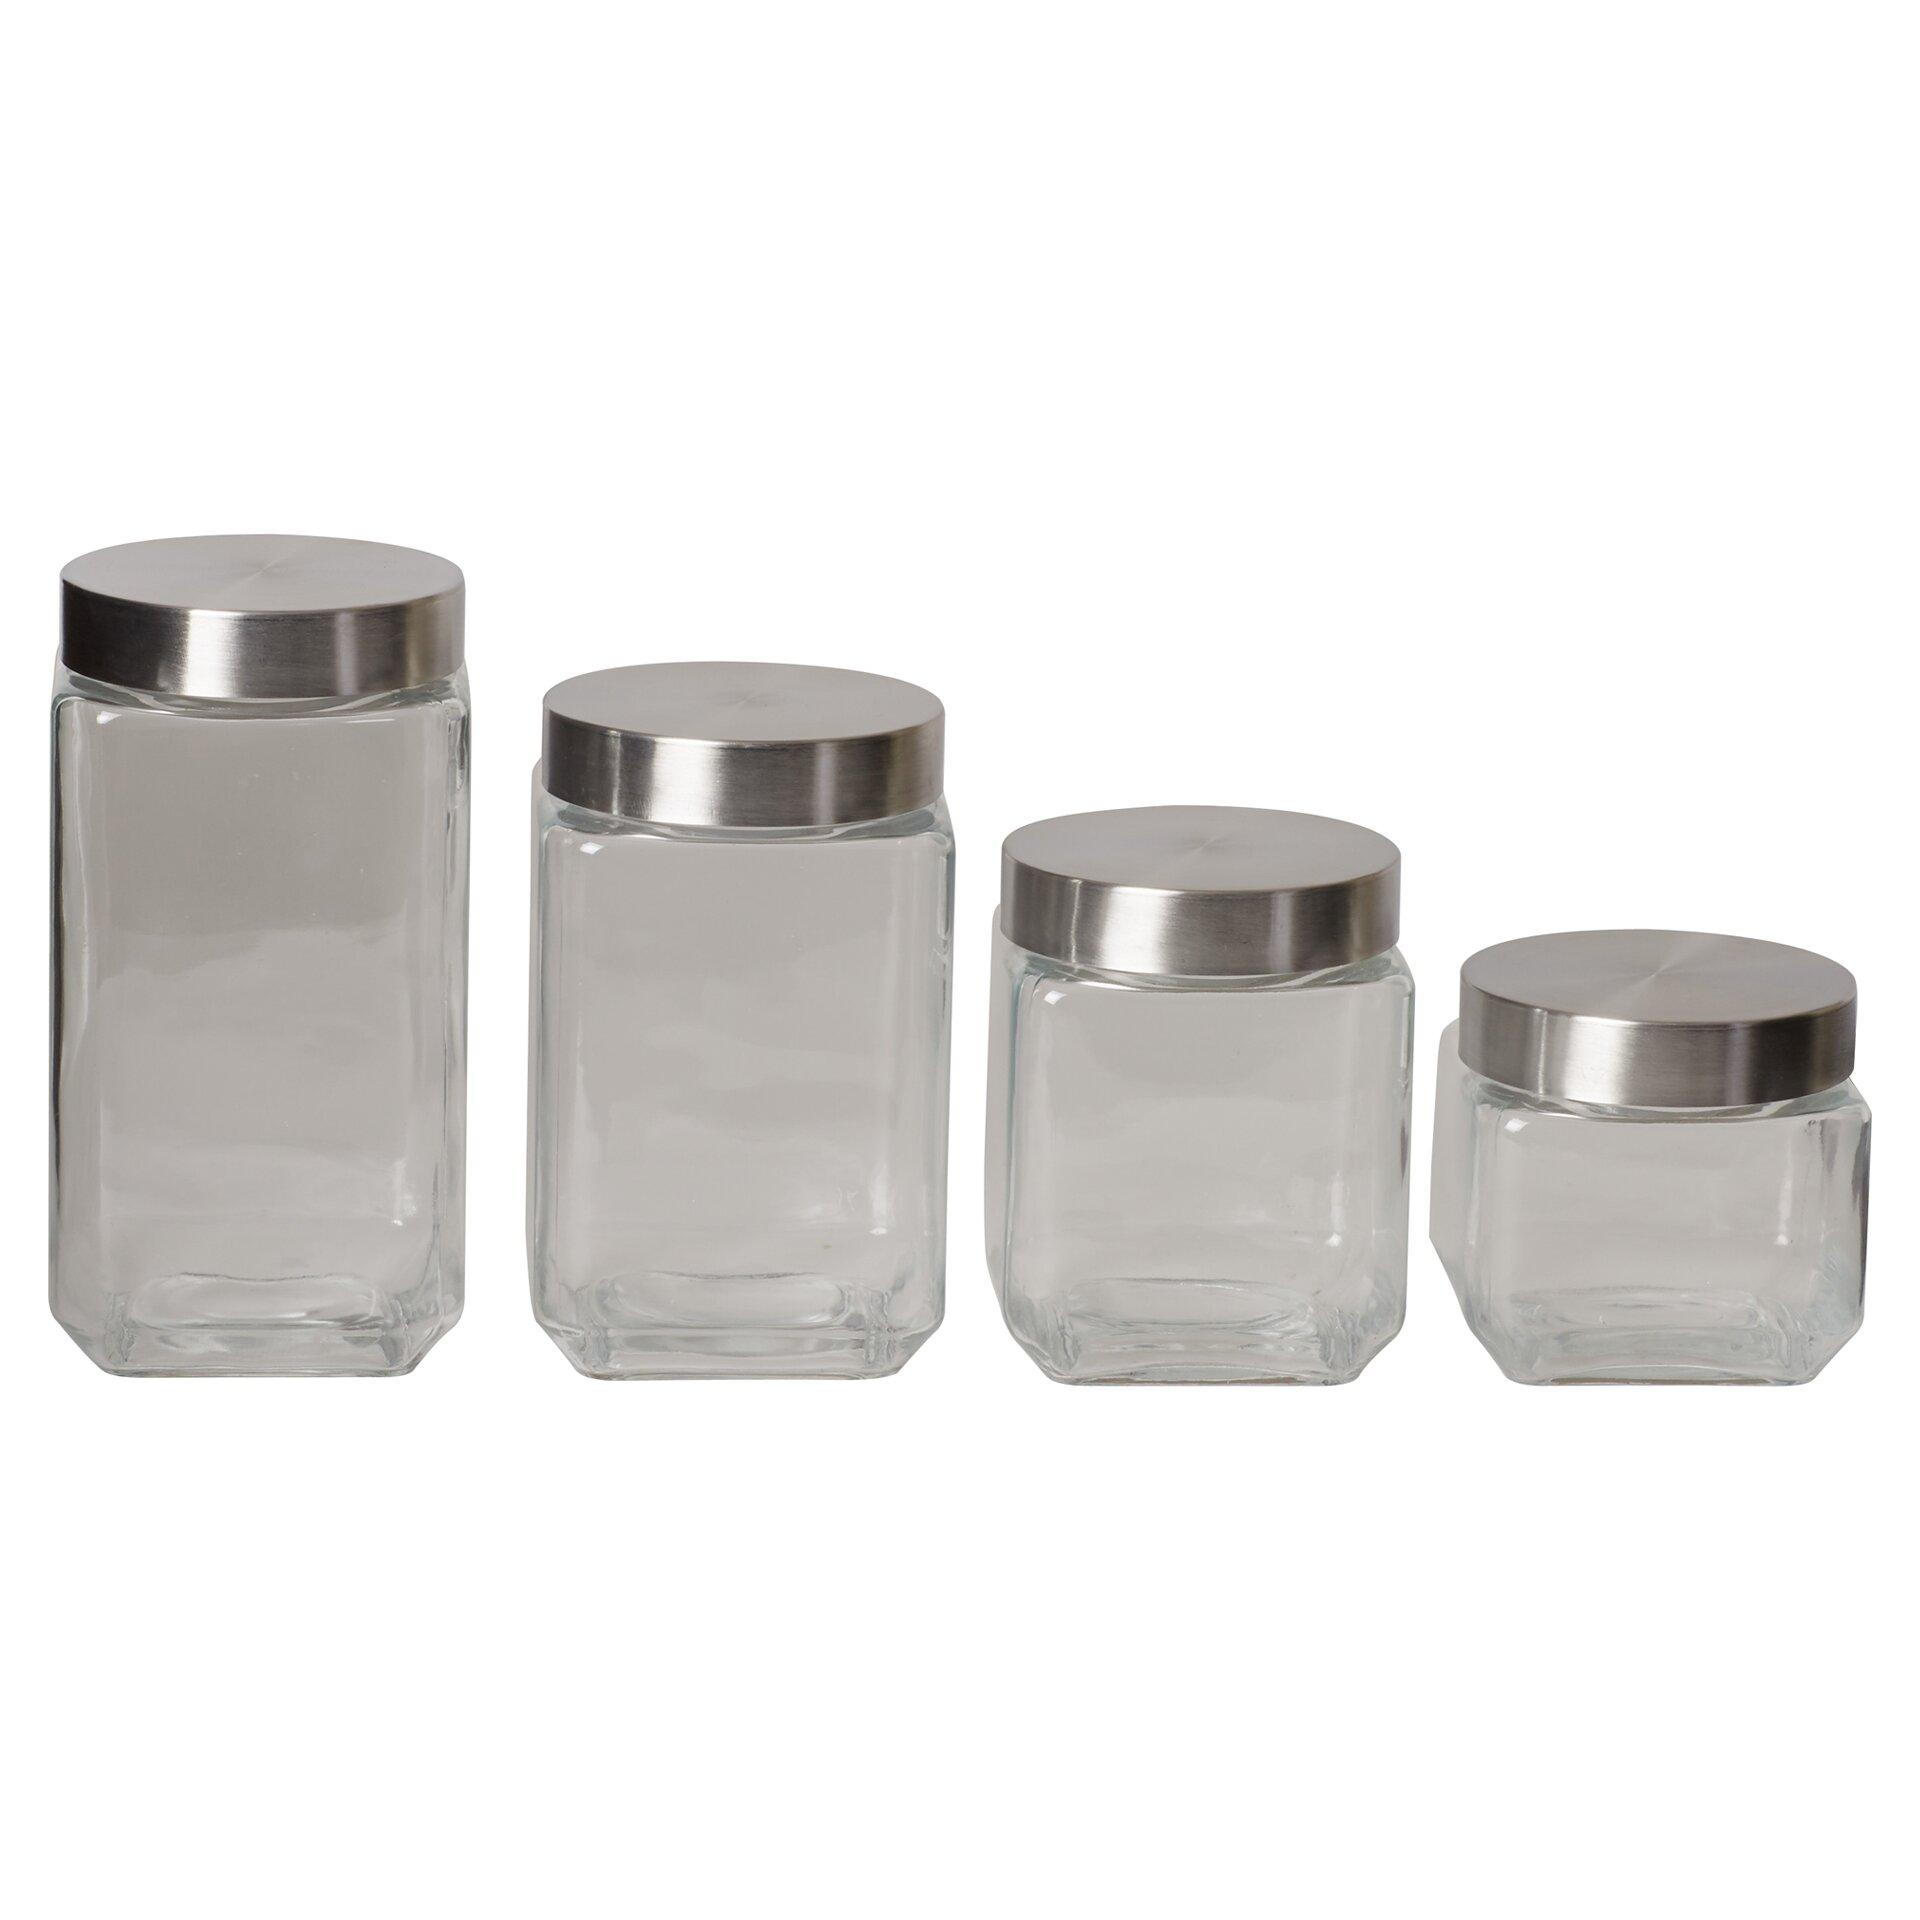 wayfair basics wayfair basics 4 piece kitchen canister